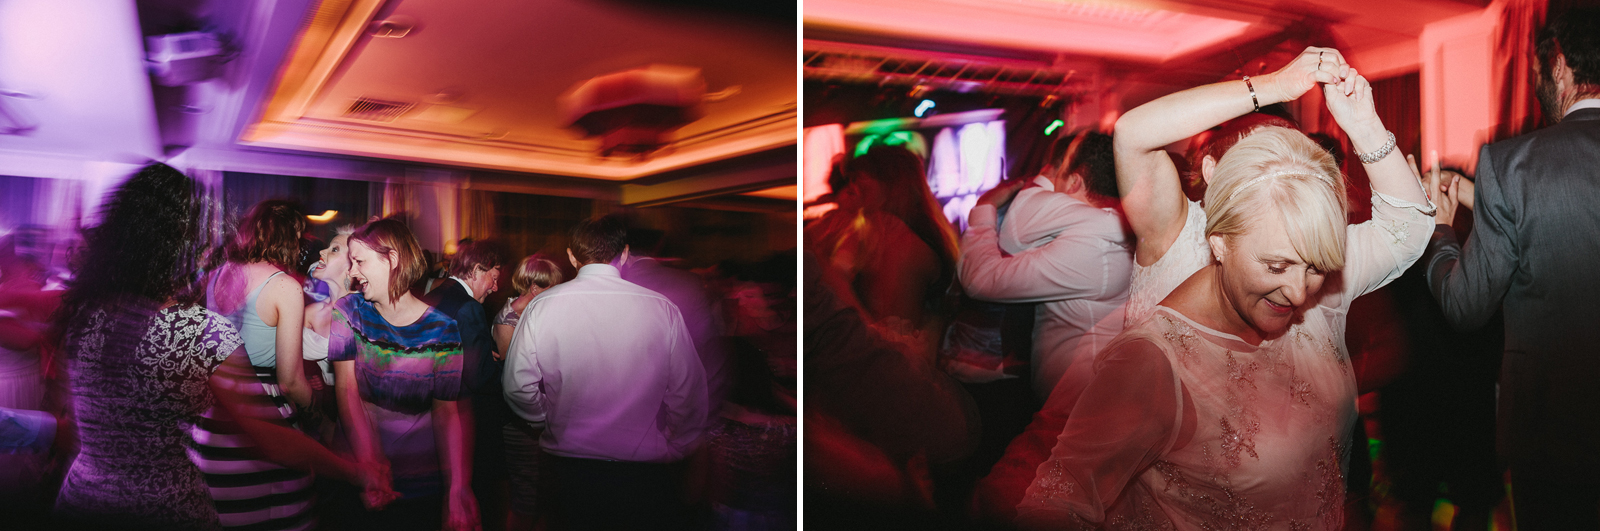 TheCampbells_Merchant_Hotel_Wedding_4.jpg